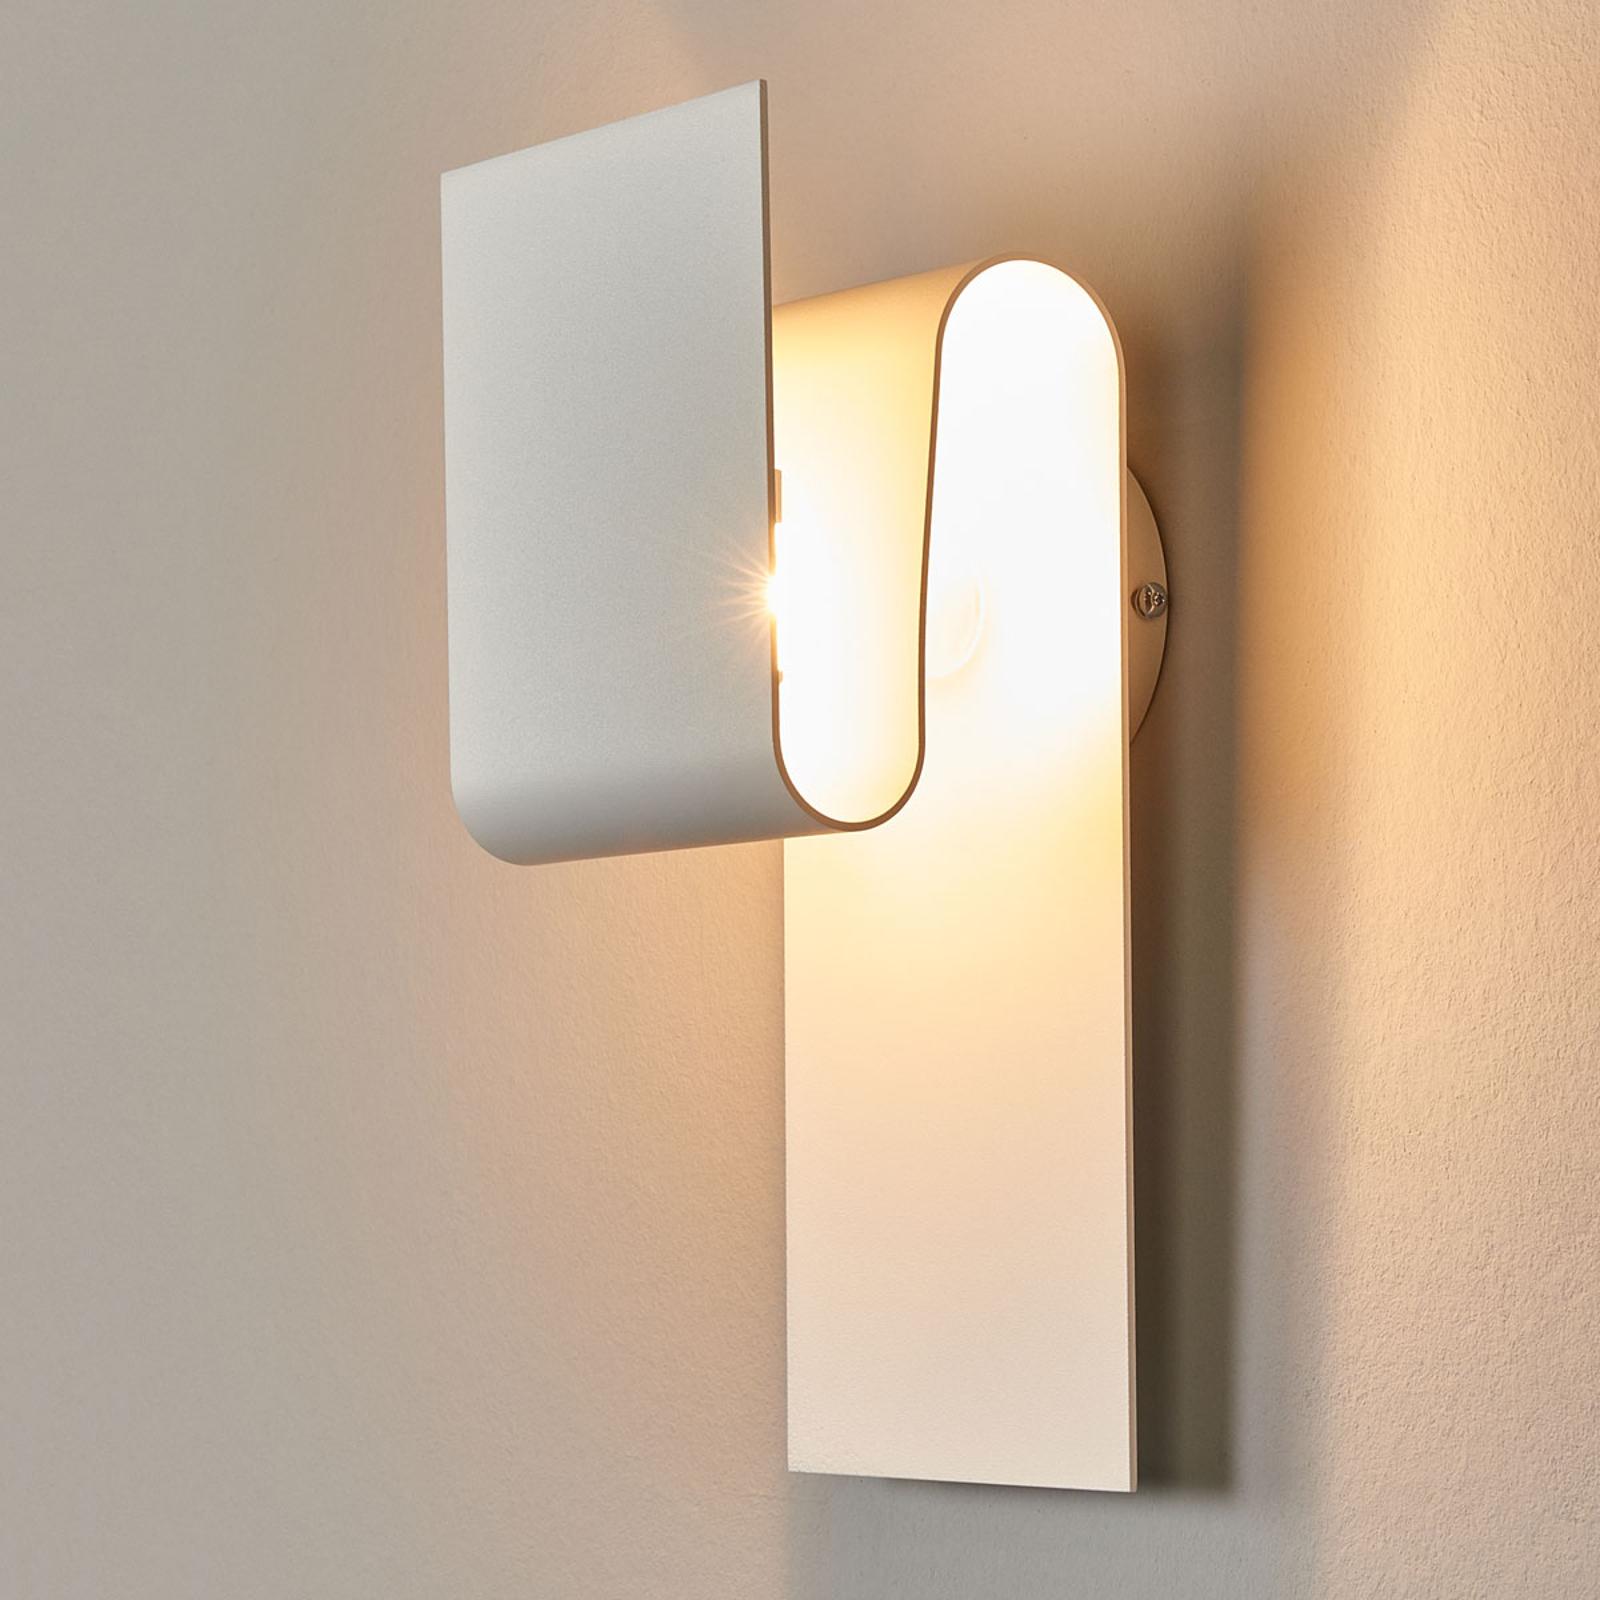 Escale Fold - mattvit LED-vägglampa